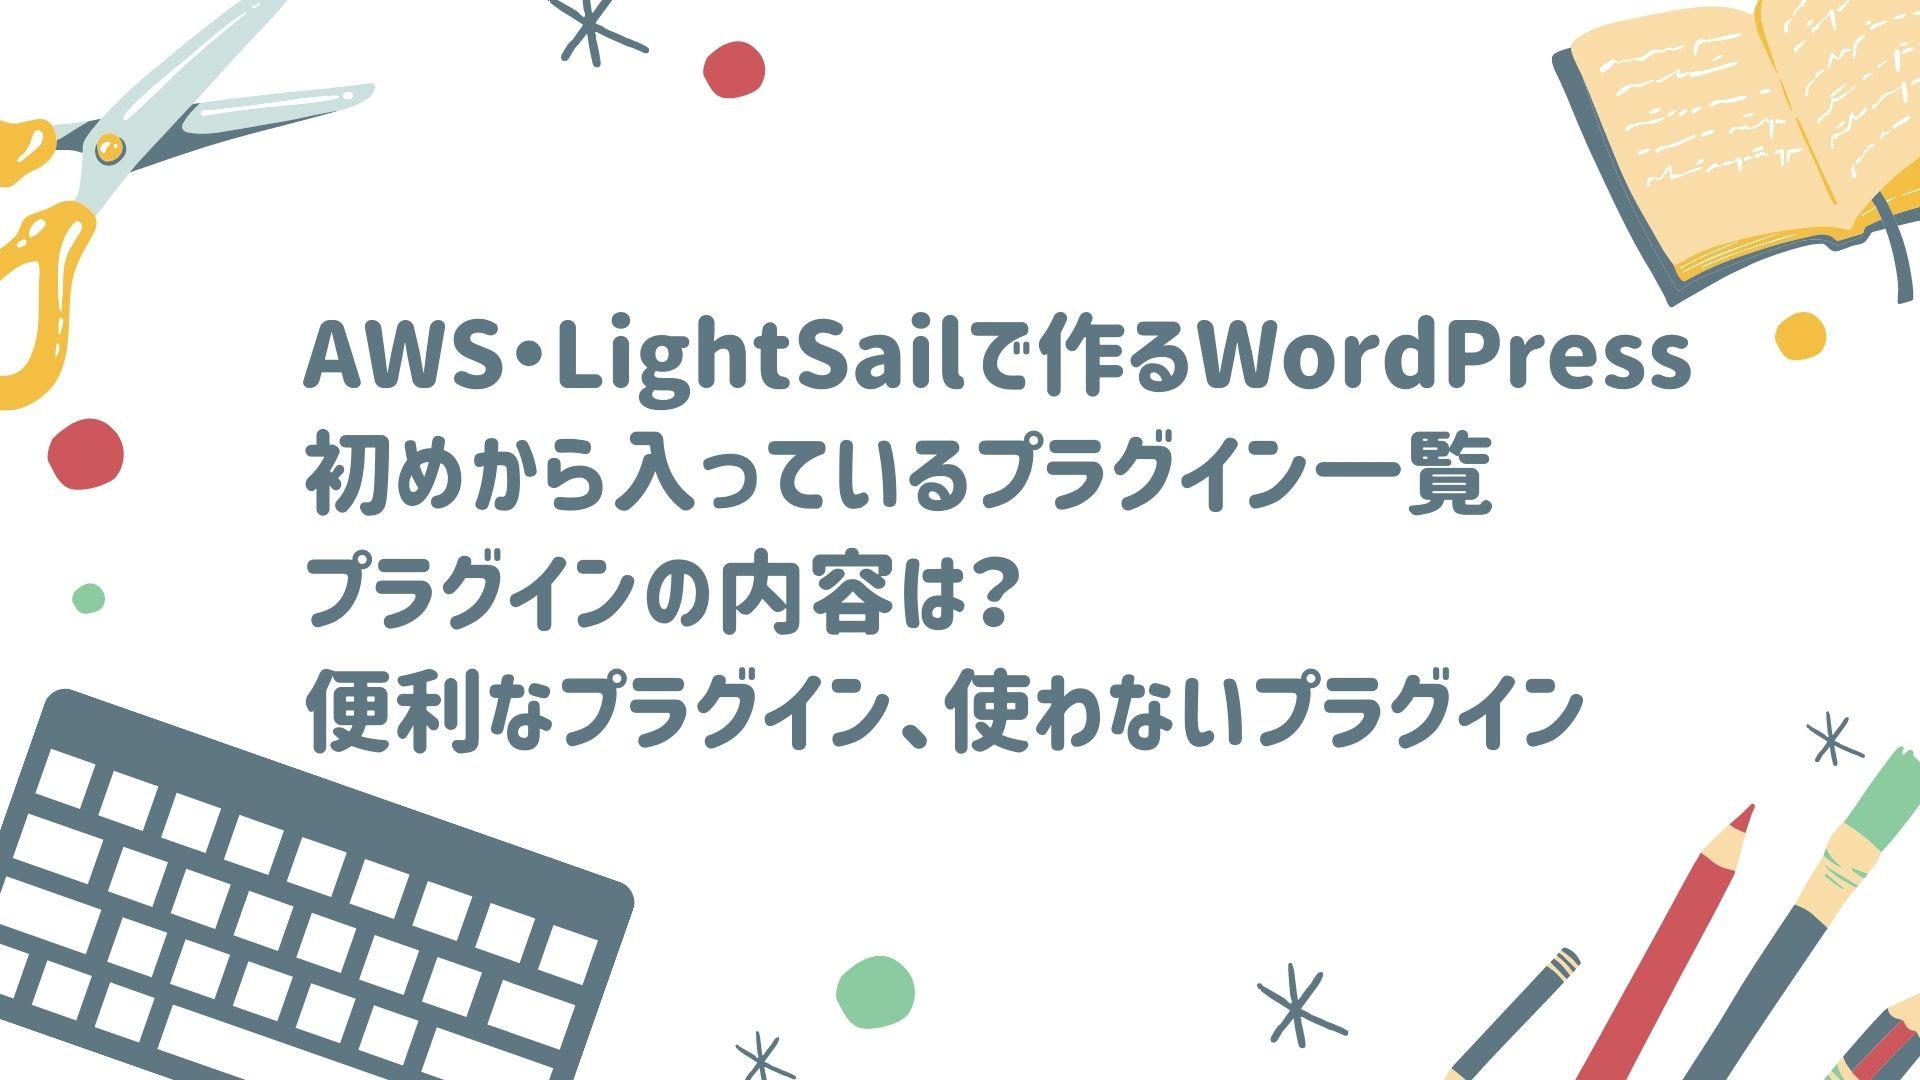 AWSのWordPressに初期導入のプラグイン